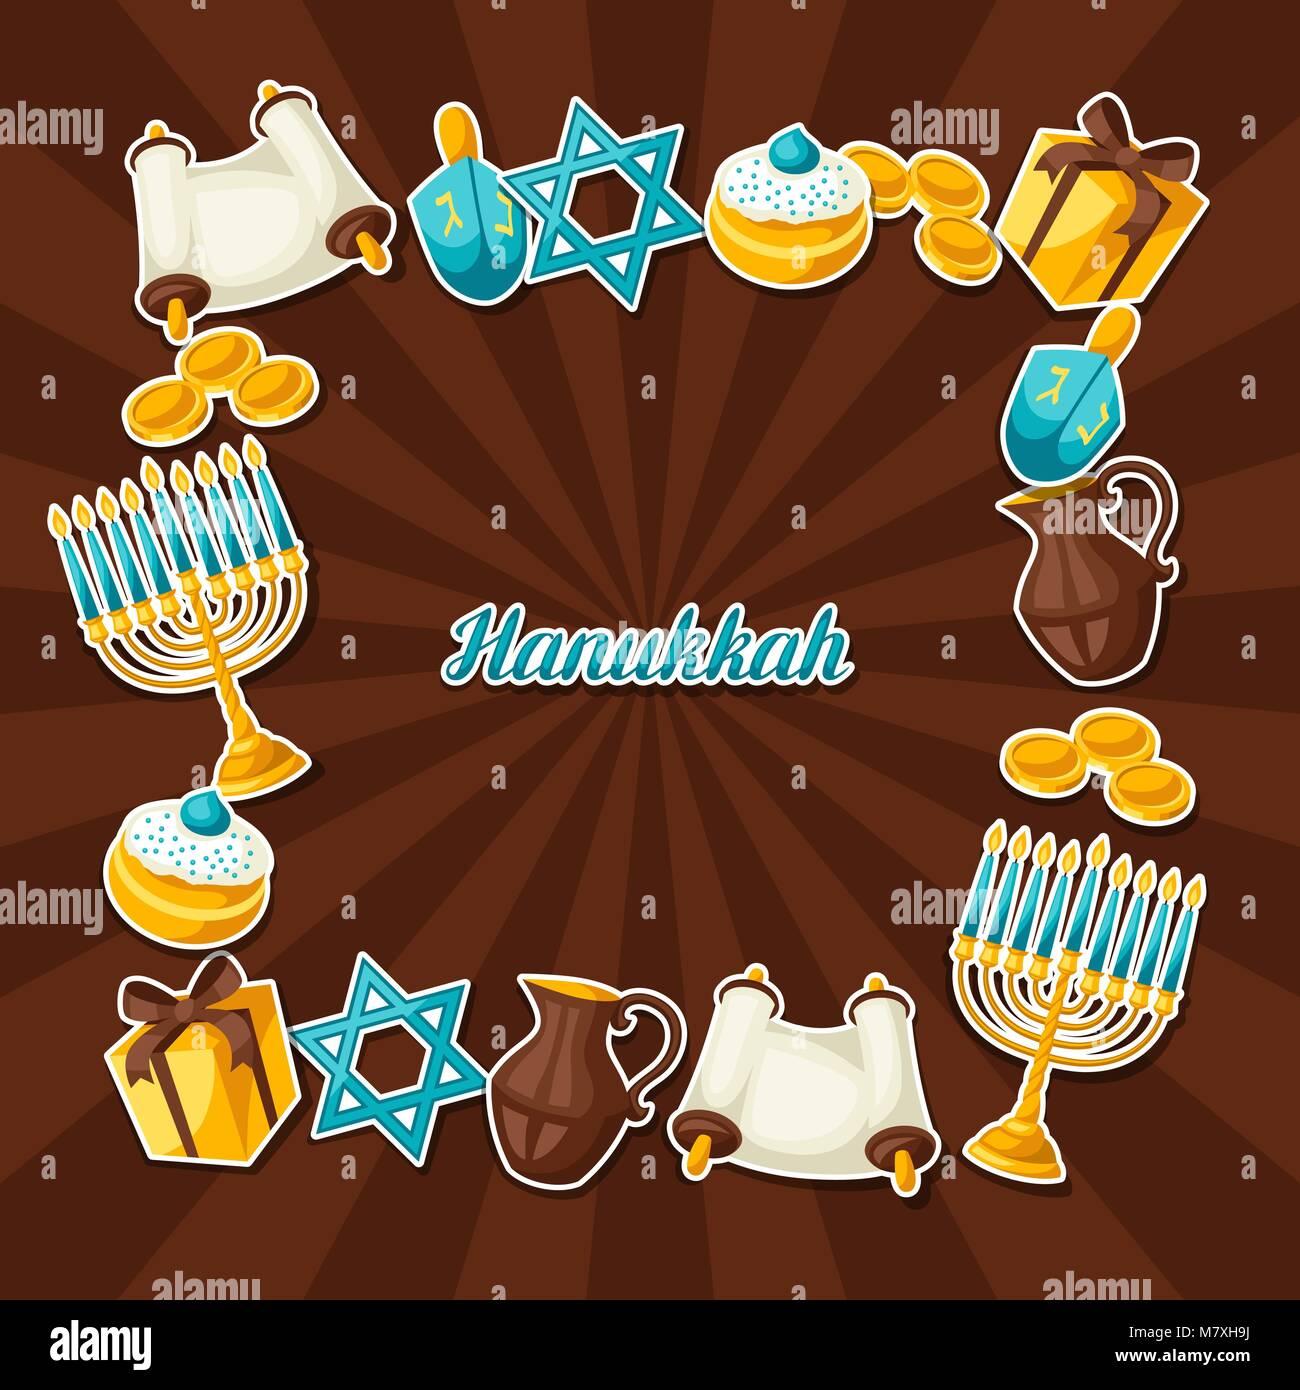 Jewish Hanukkah celebration frame with holiday sticker objects - Stock Vector